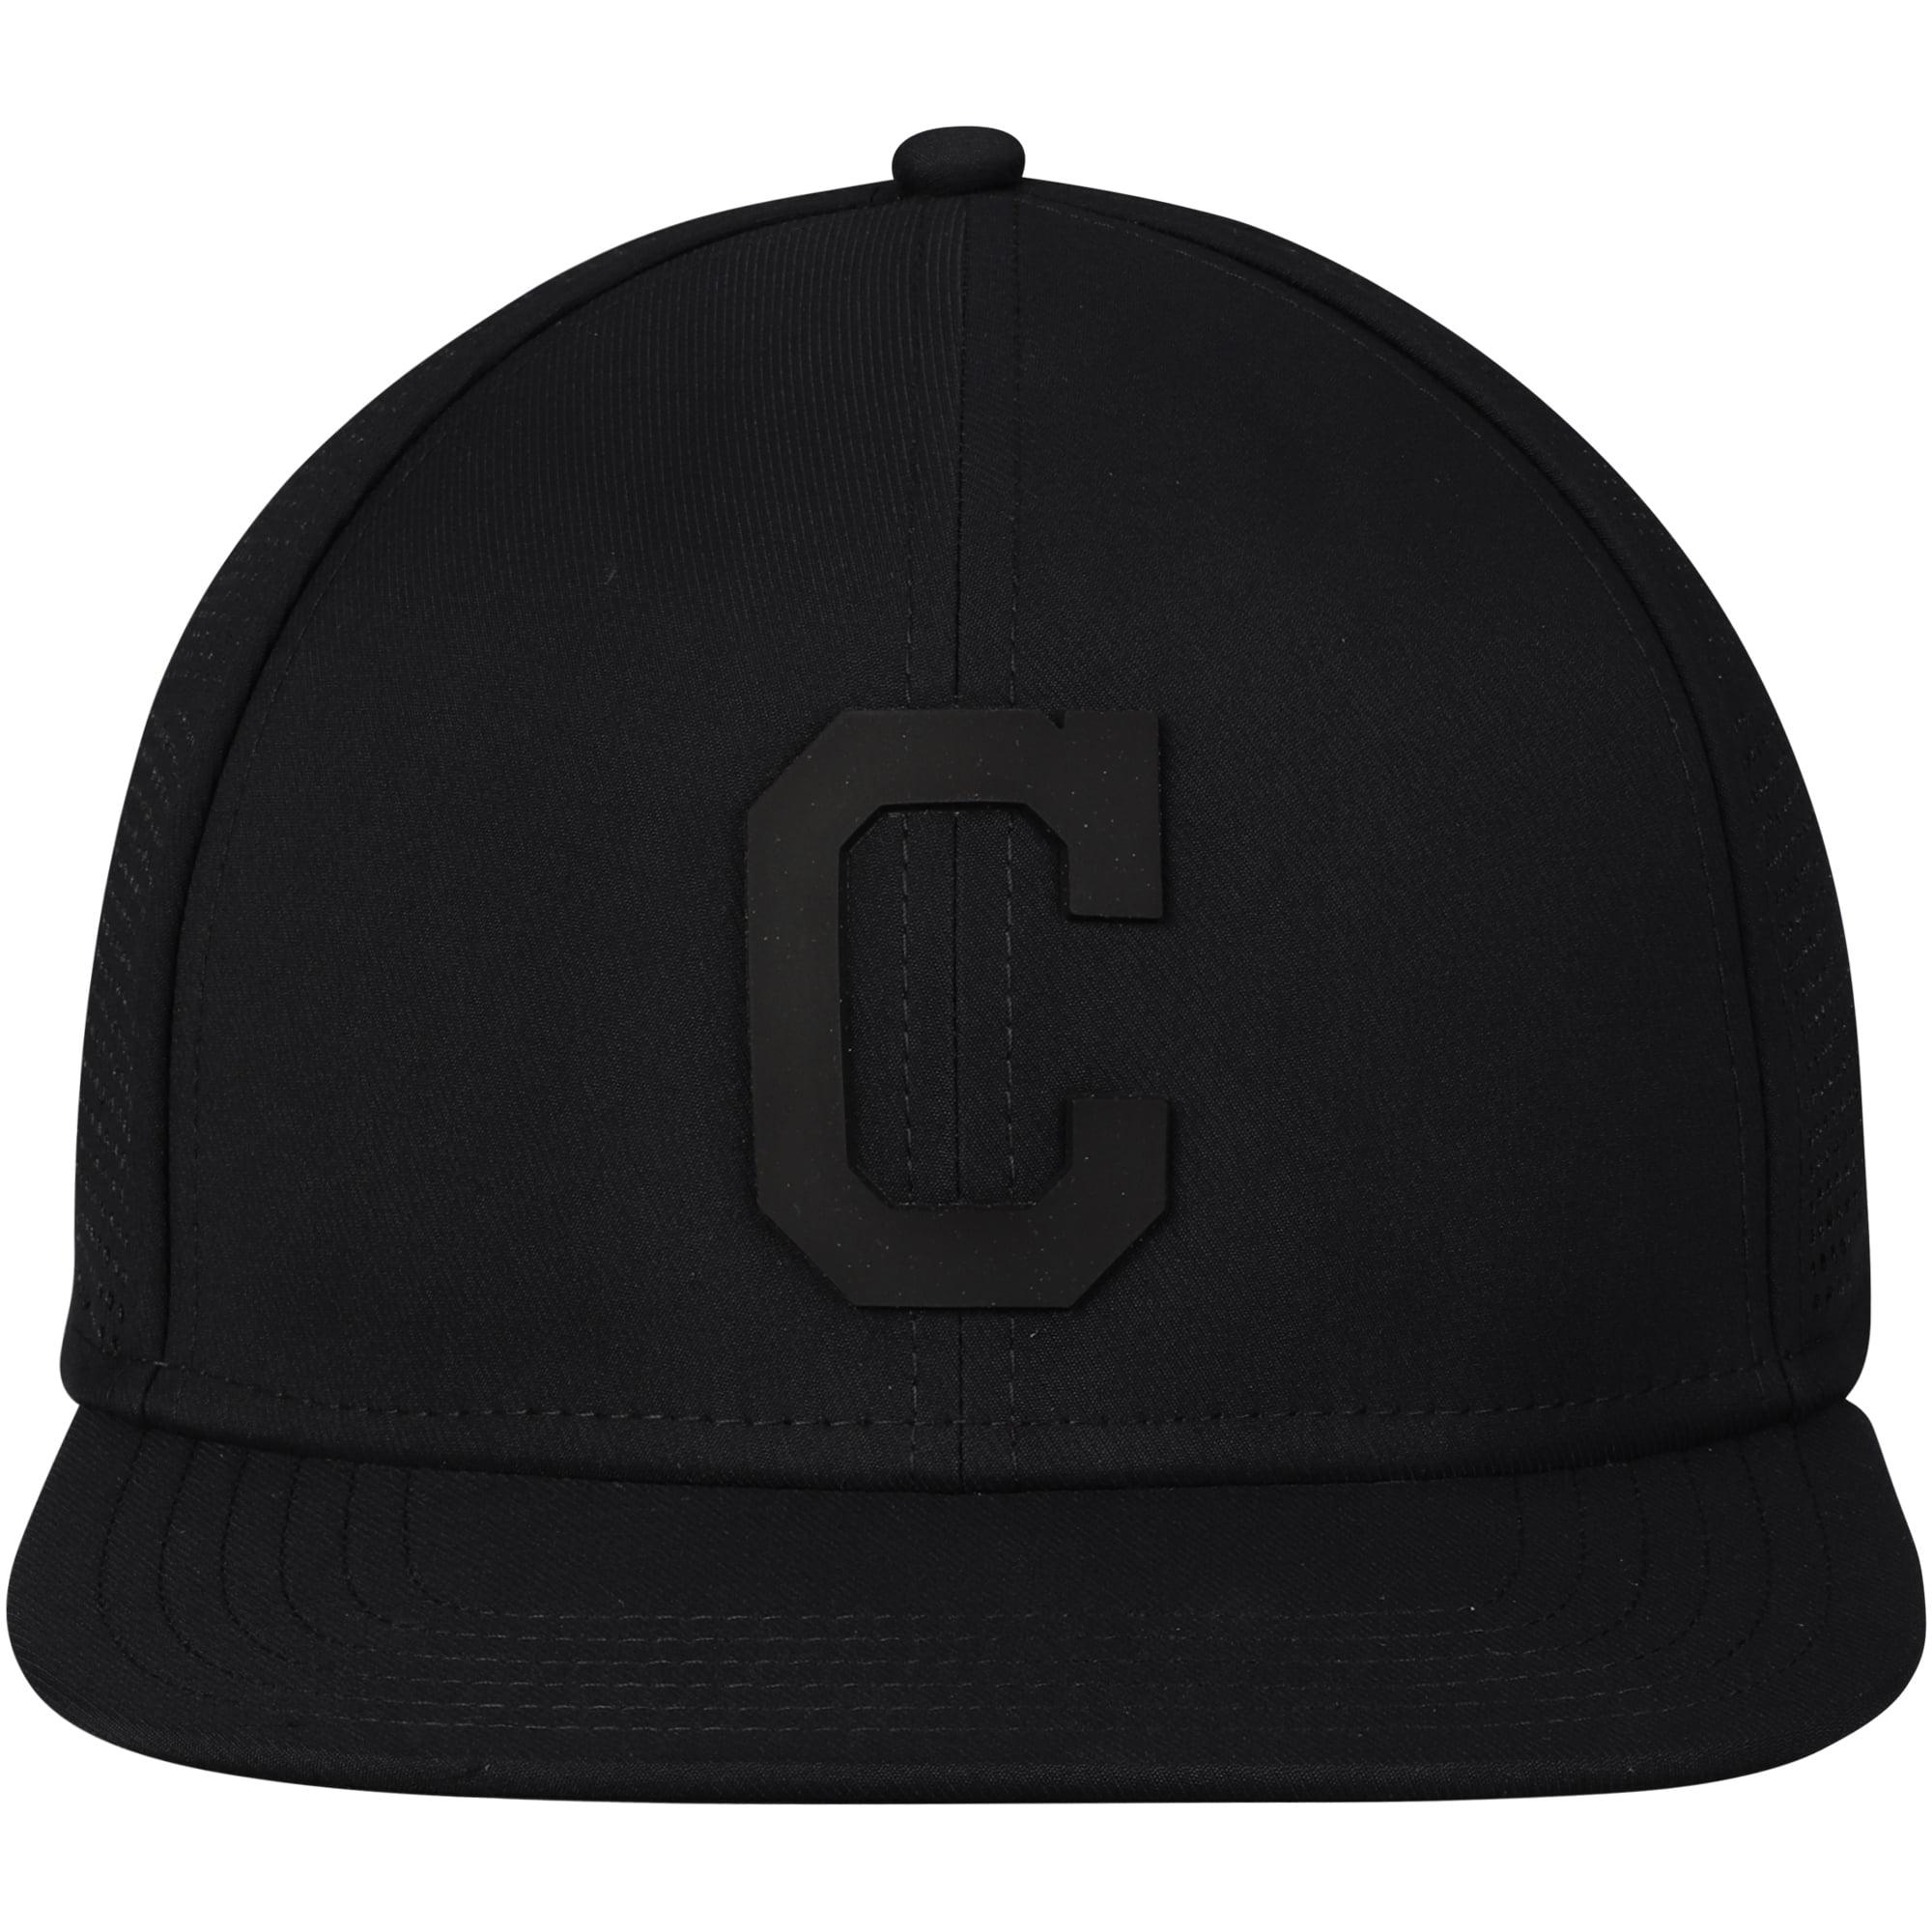 on sale 6dacd 7691d Cleveland Indians Under Armour Supervent Performance Team Logo Adjustable  Hat - Black - OSFA - Walmart.com